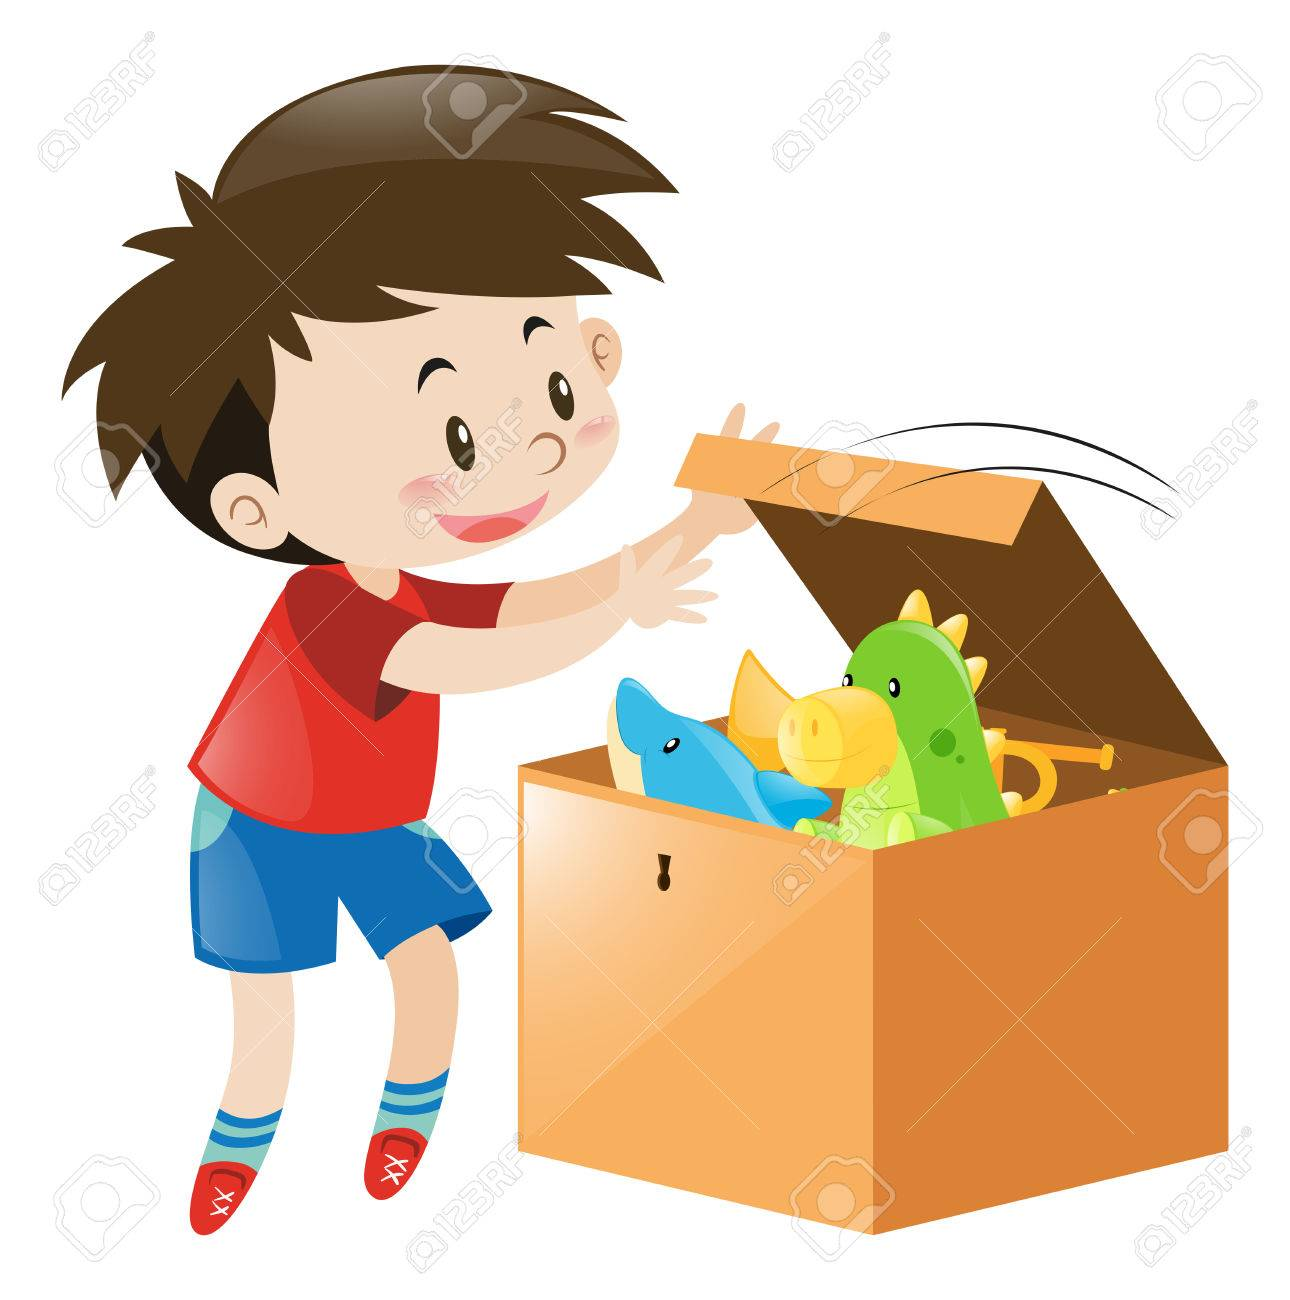 Boy open box full of toys illustration.